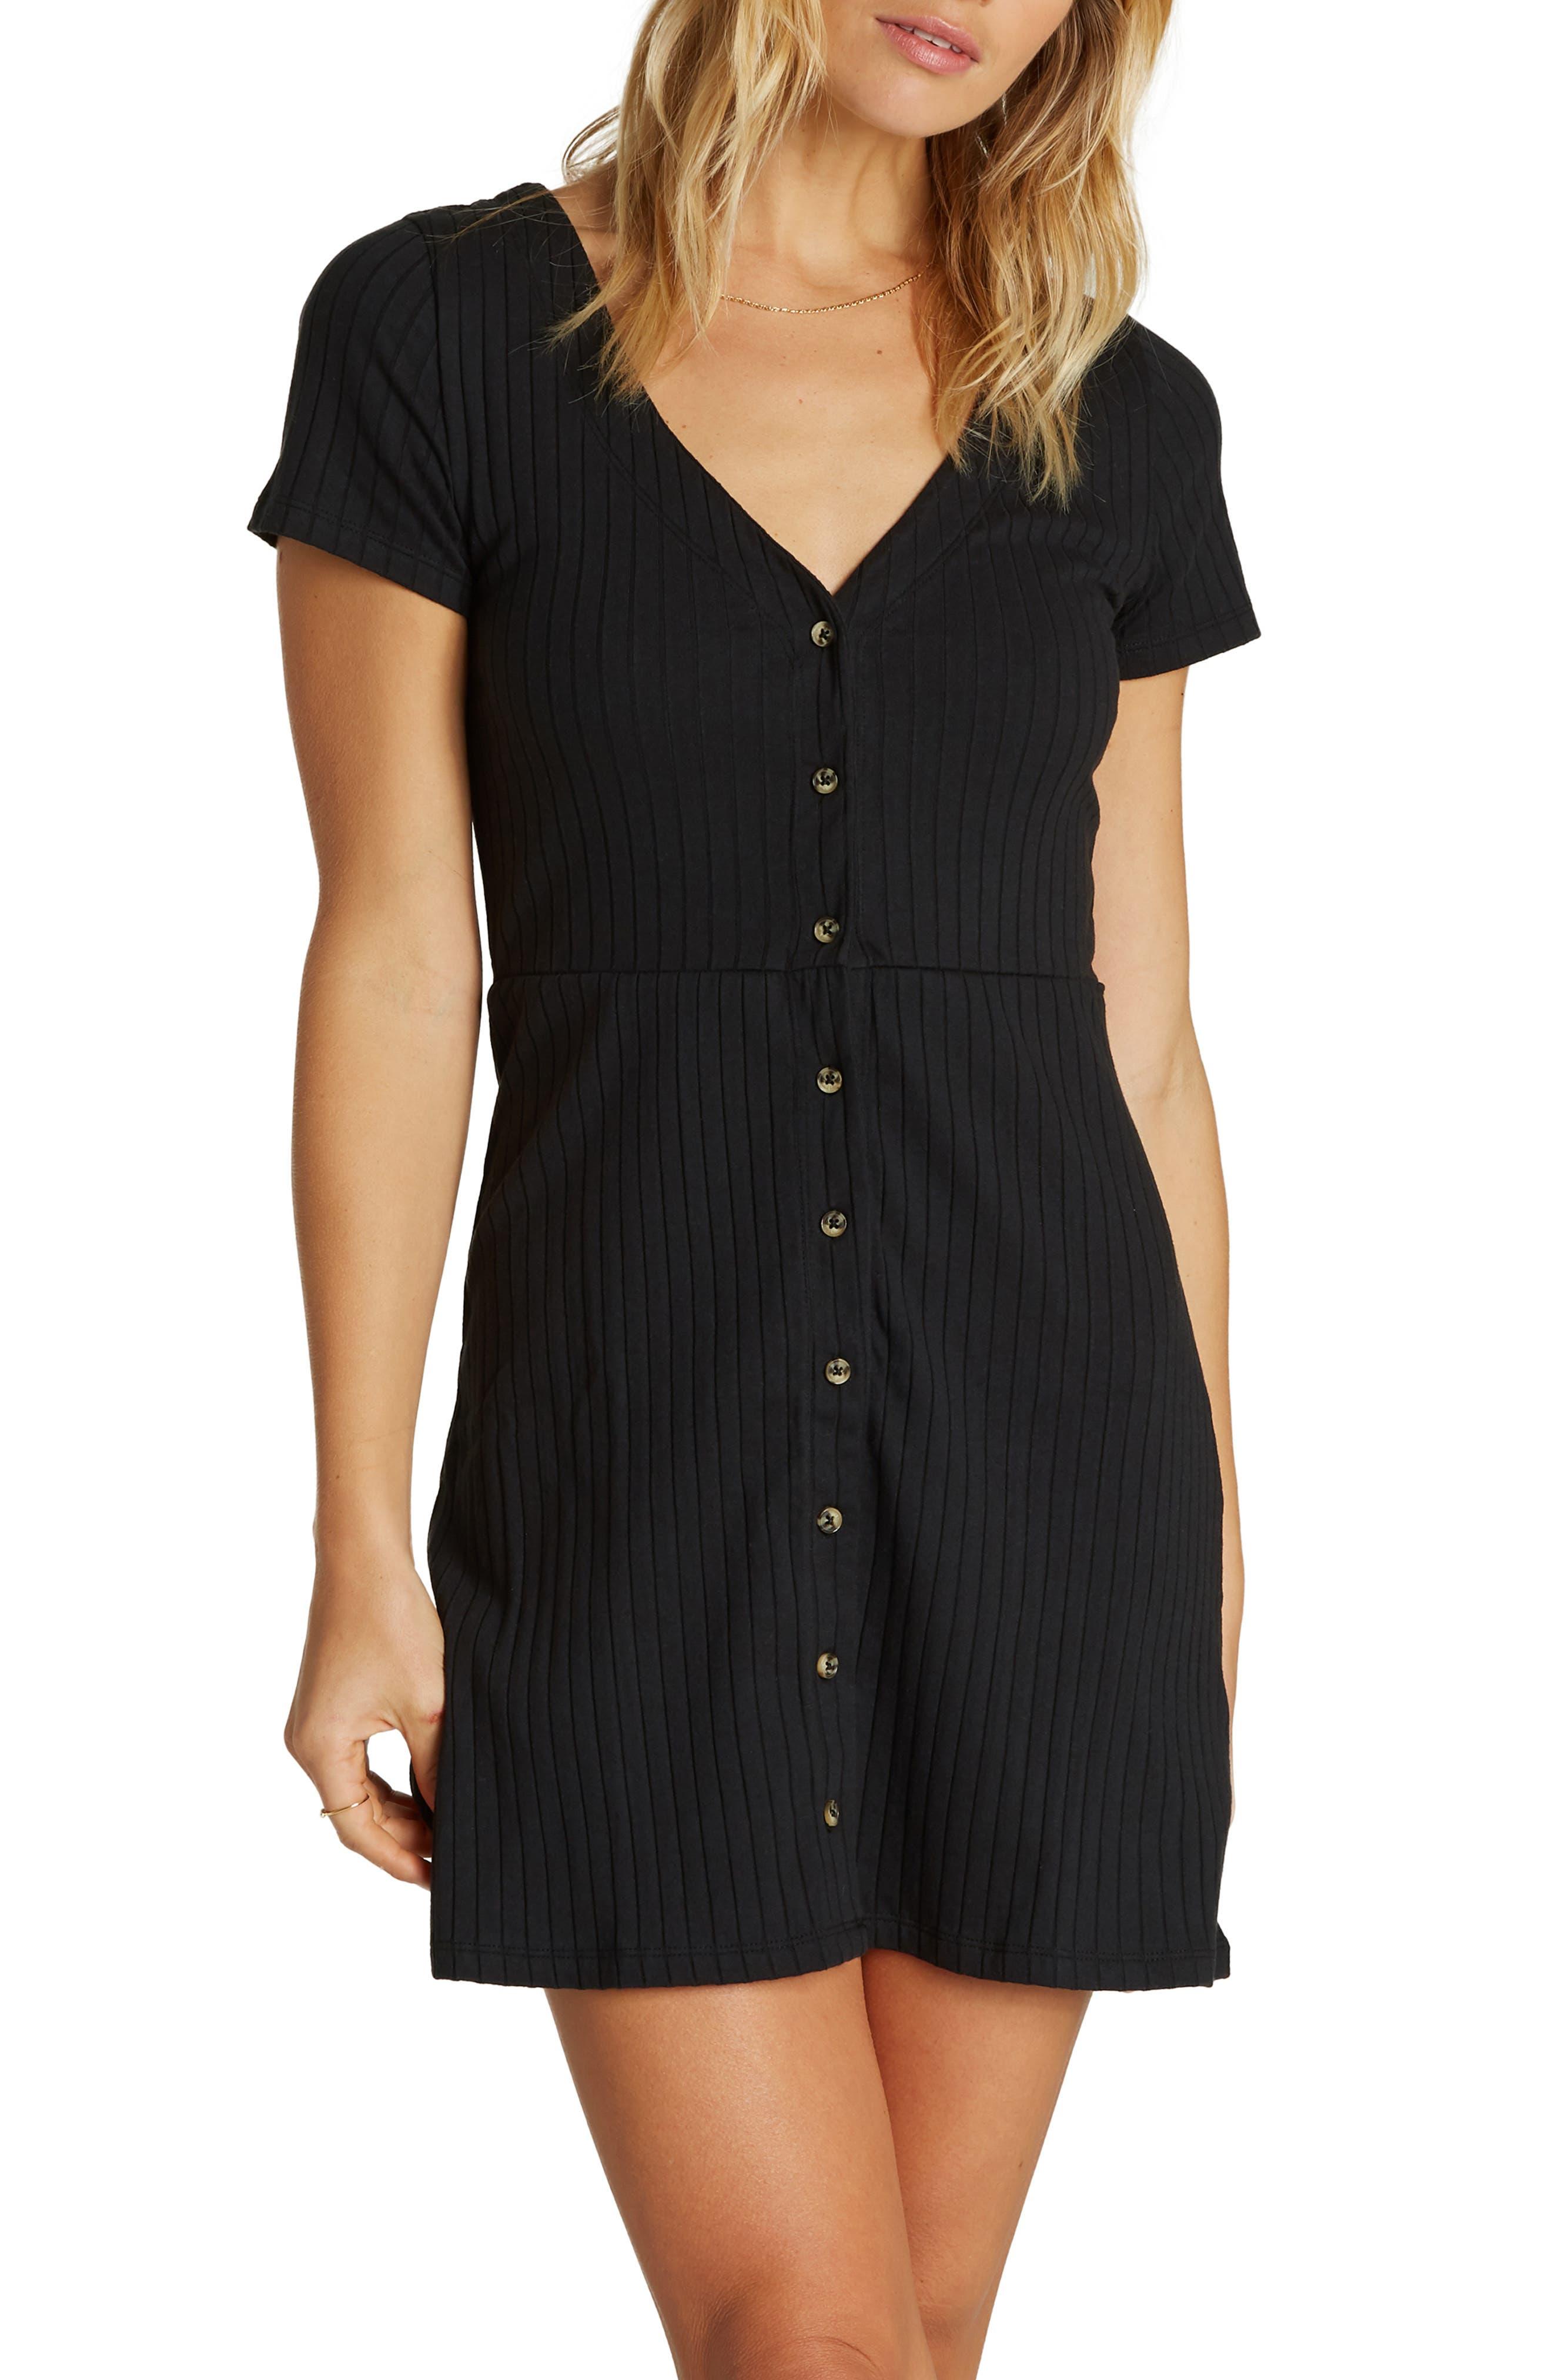 Billabong On With It Minidress, Black